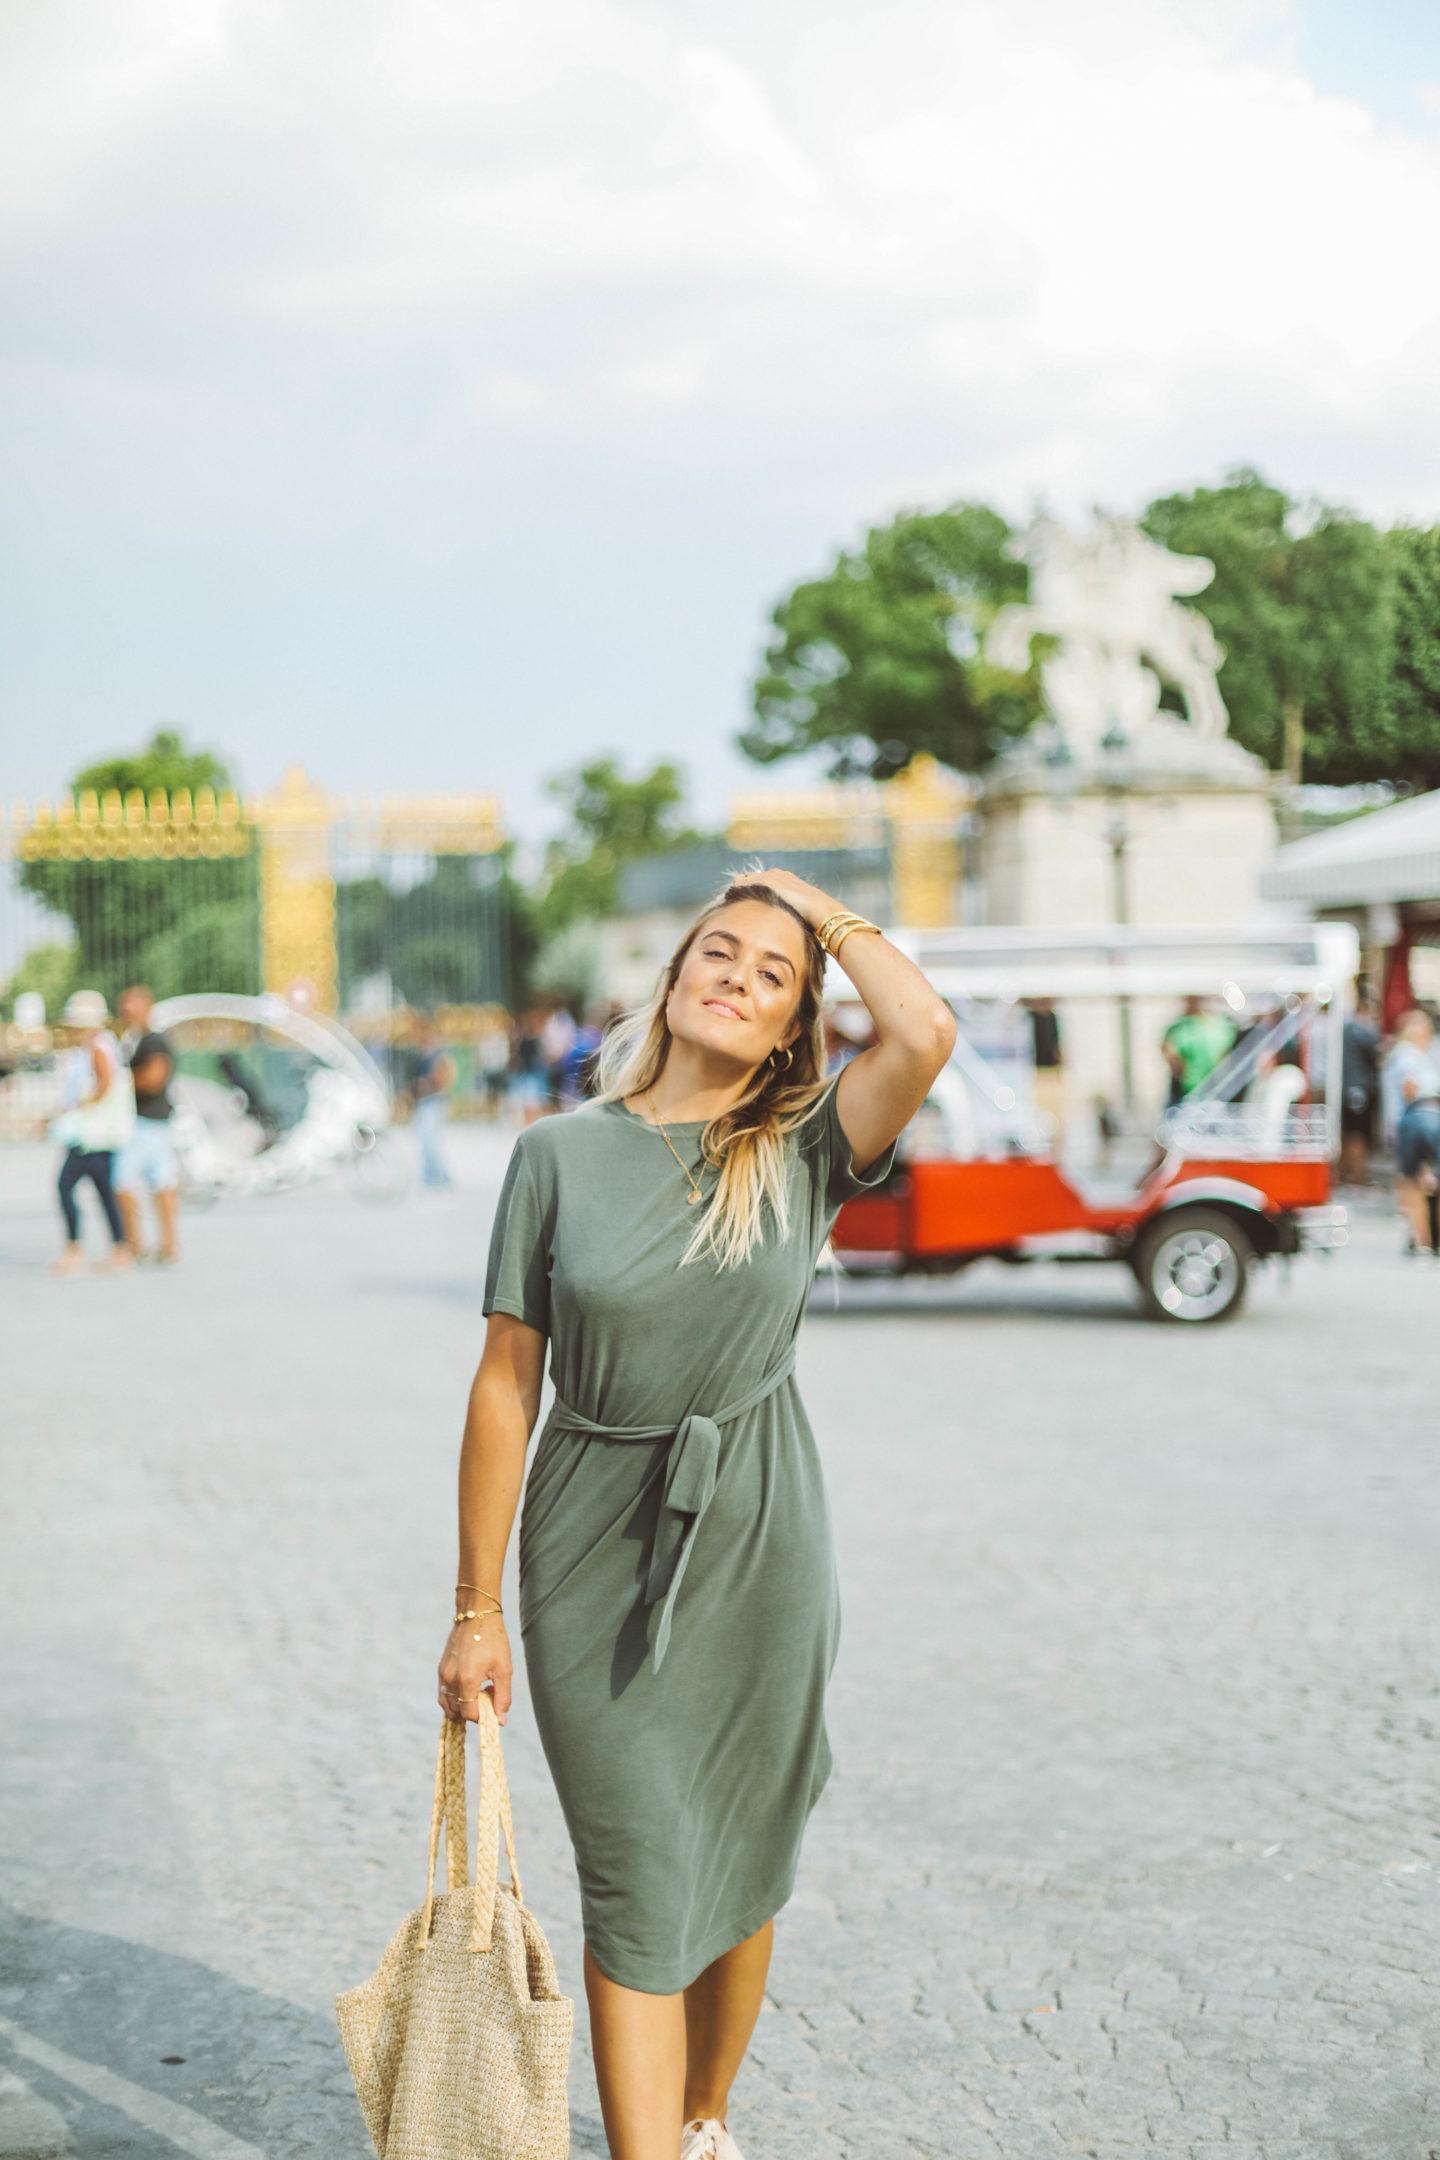 Robe ceinturée - Blondie Baby blog mode Paris et voyages